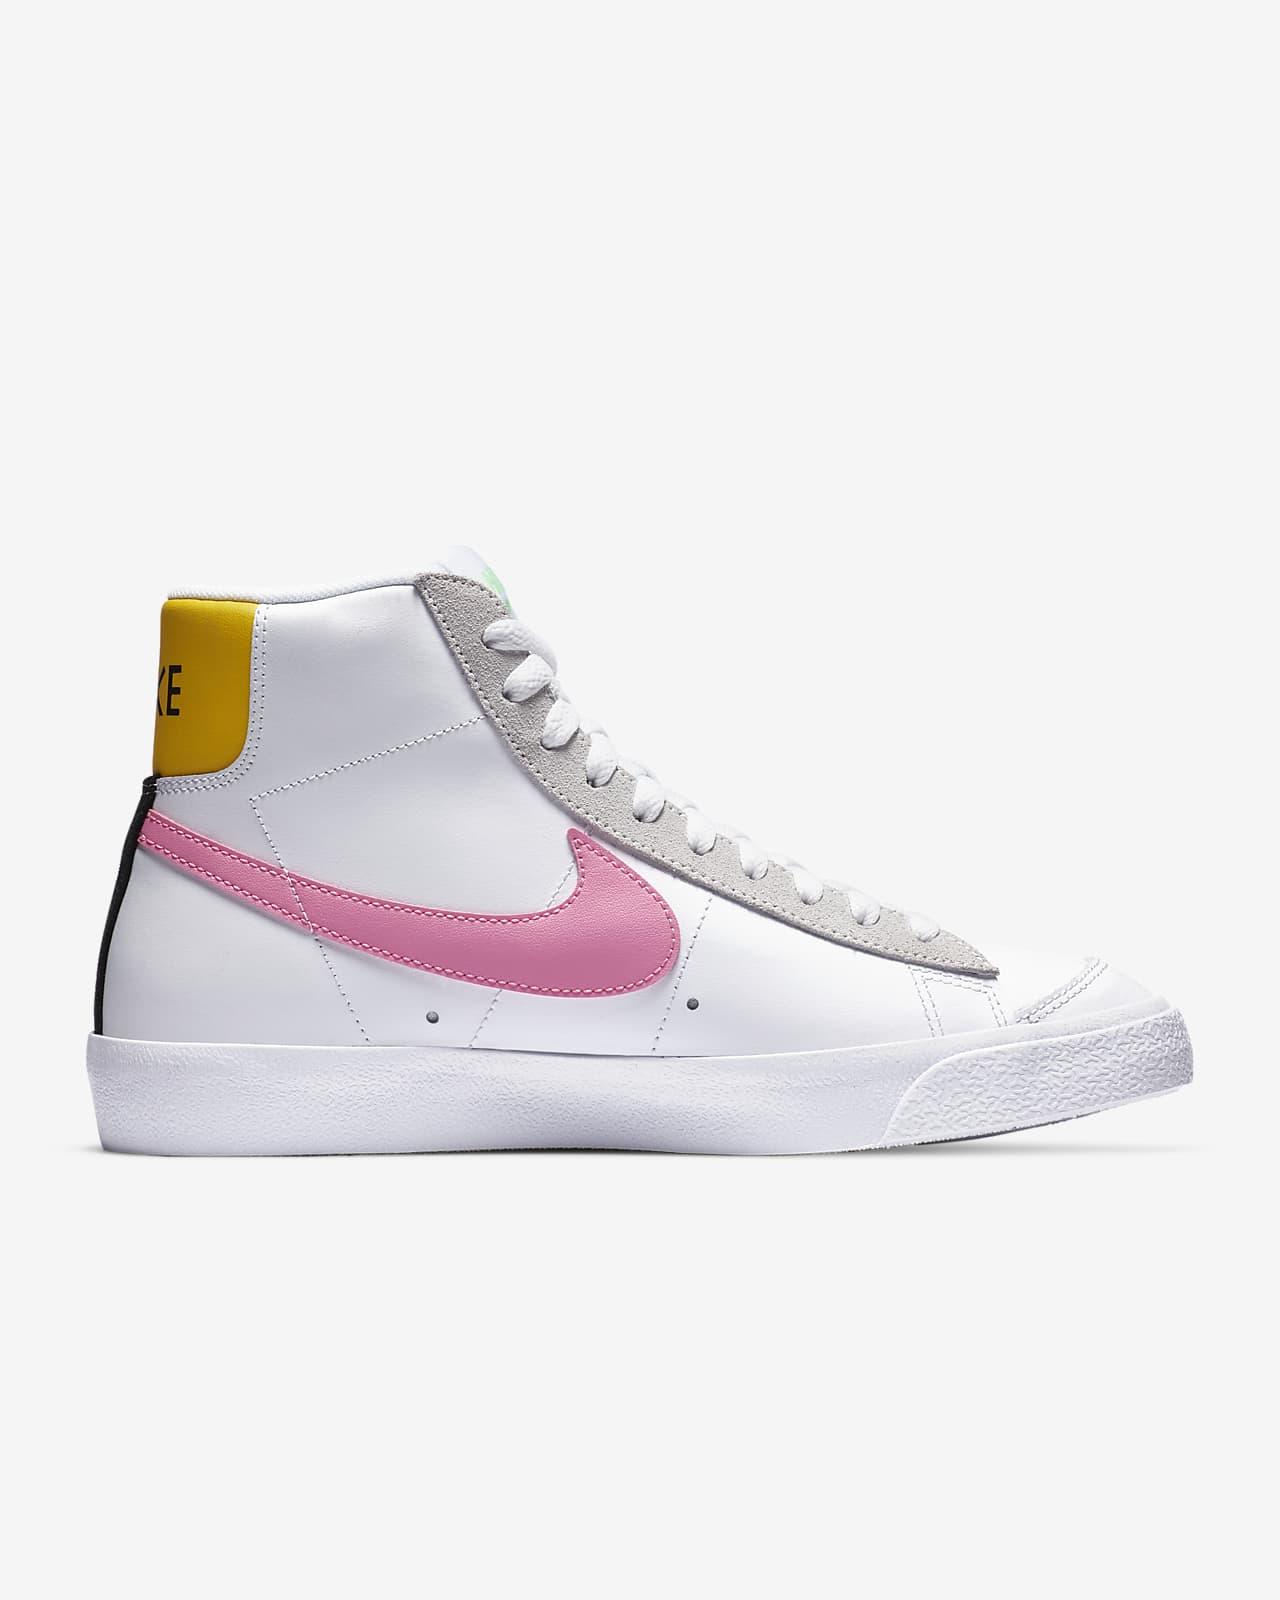 almohada Abolido Mucho bien bueno  Nike Blazer Mid Vintage '77 Women's Shoe. Nike SA